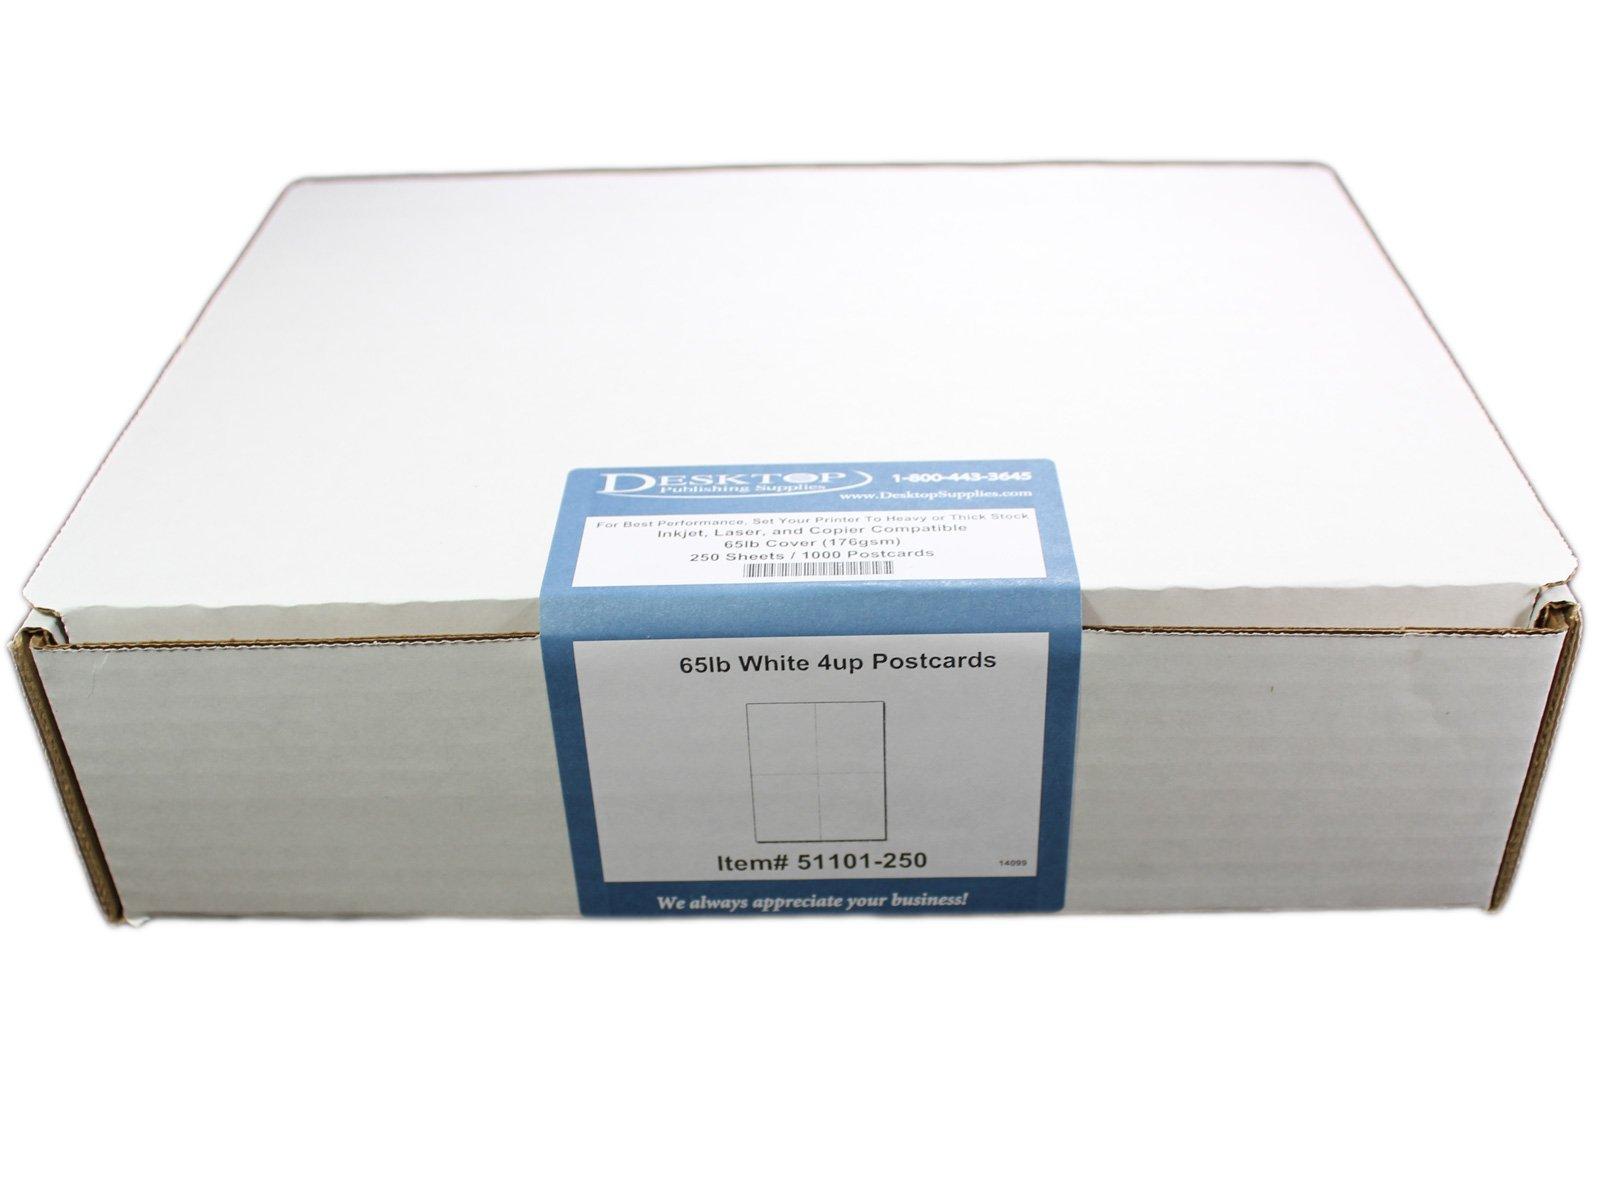 65lb White 4up Postcards - 250 Sheets/1000 Postcards - Desktop Publishing Supplies, Inc.TM Brand by Desktop Publishing Supplies, Inc.